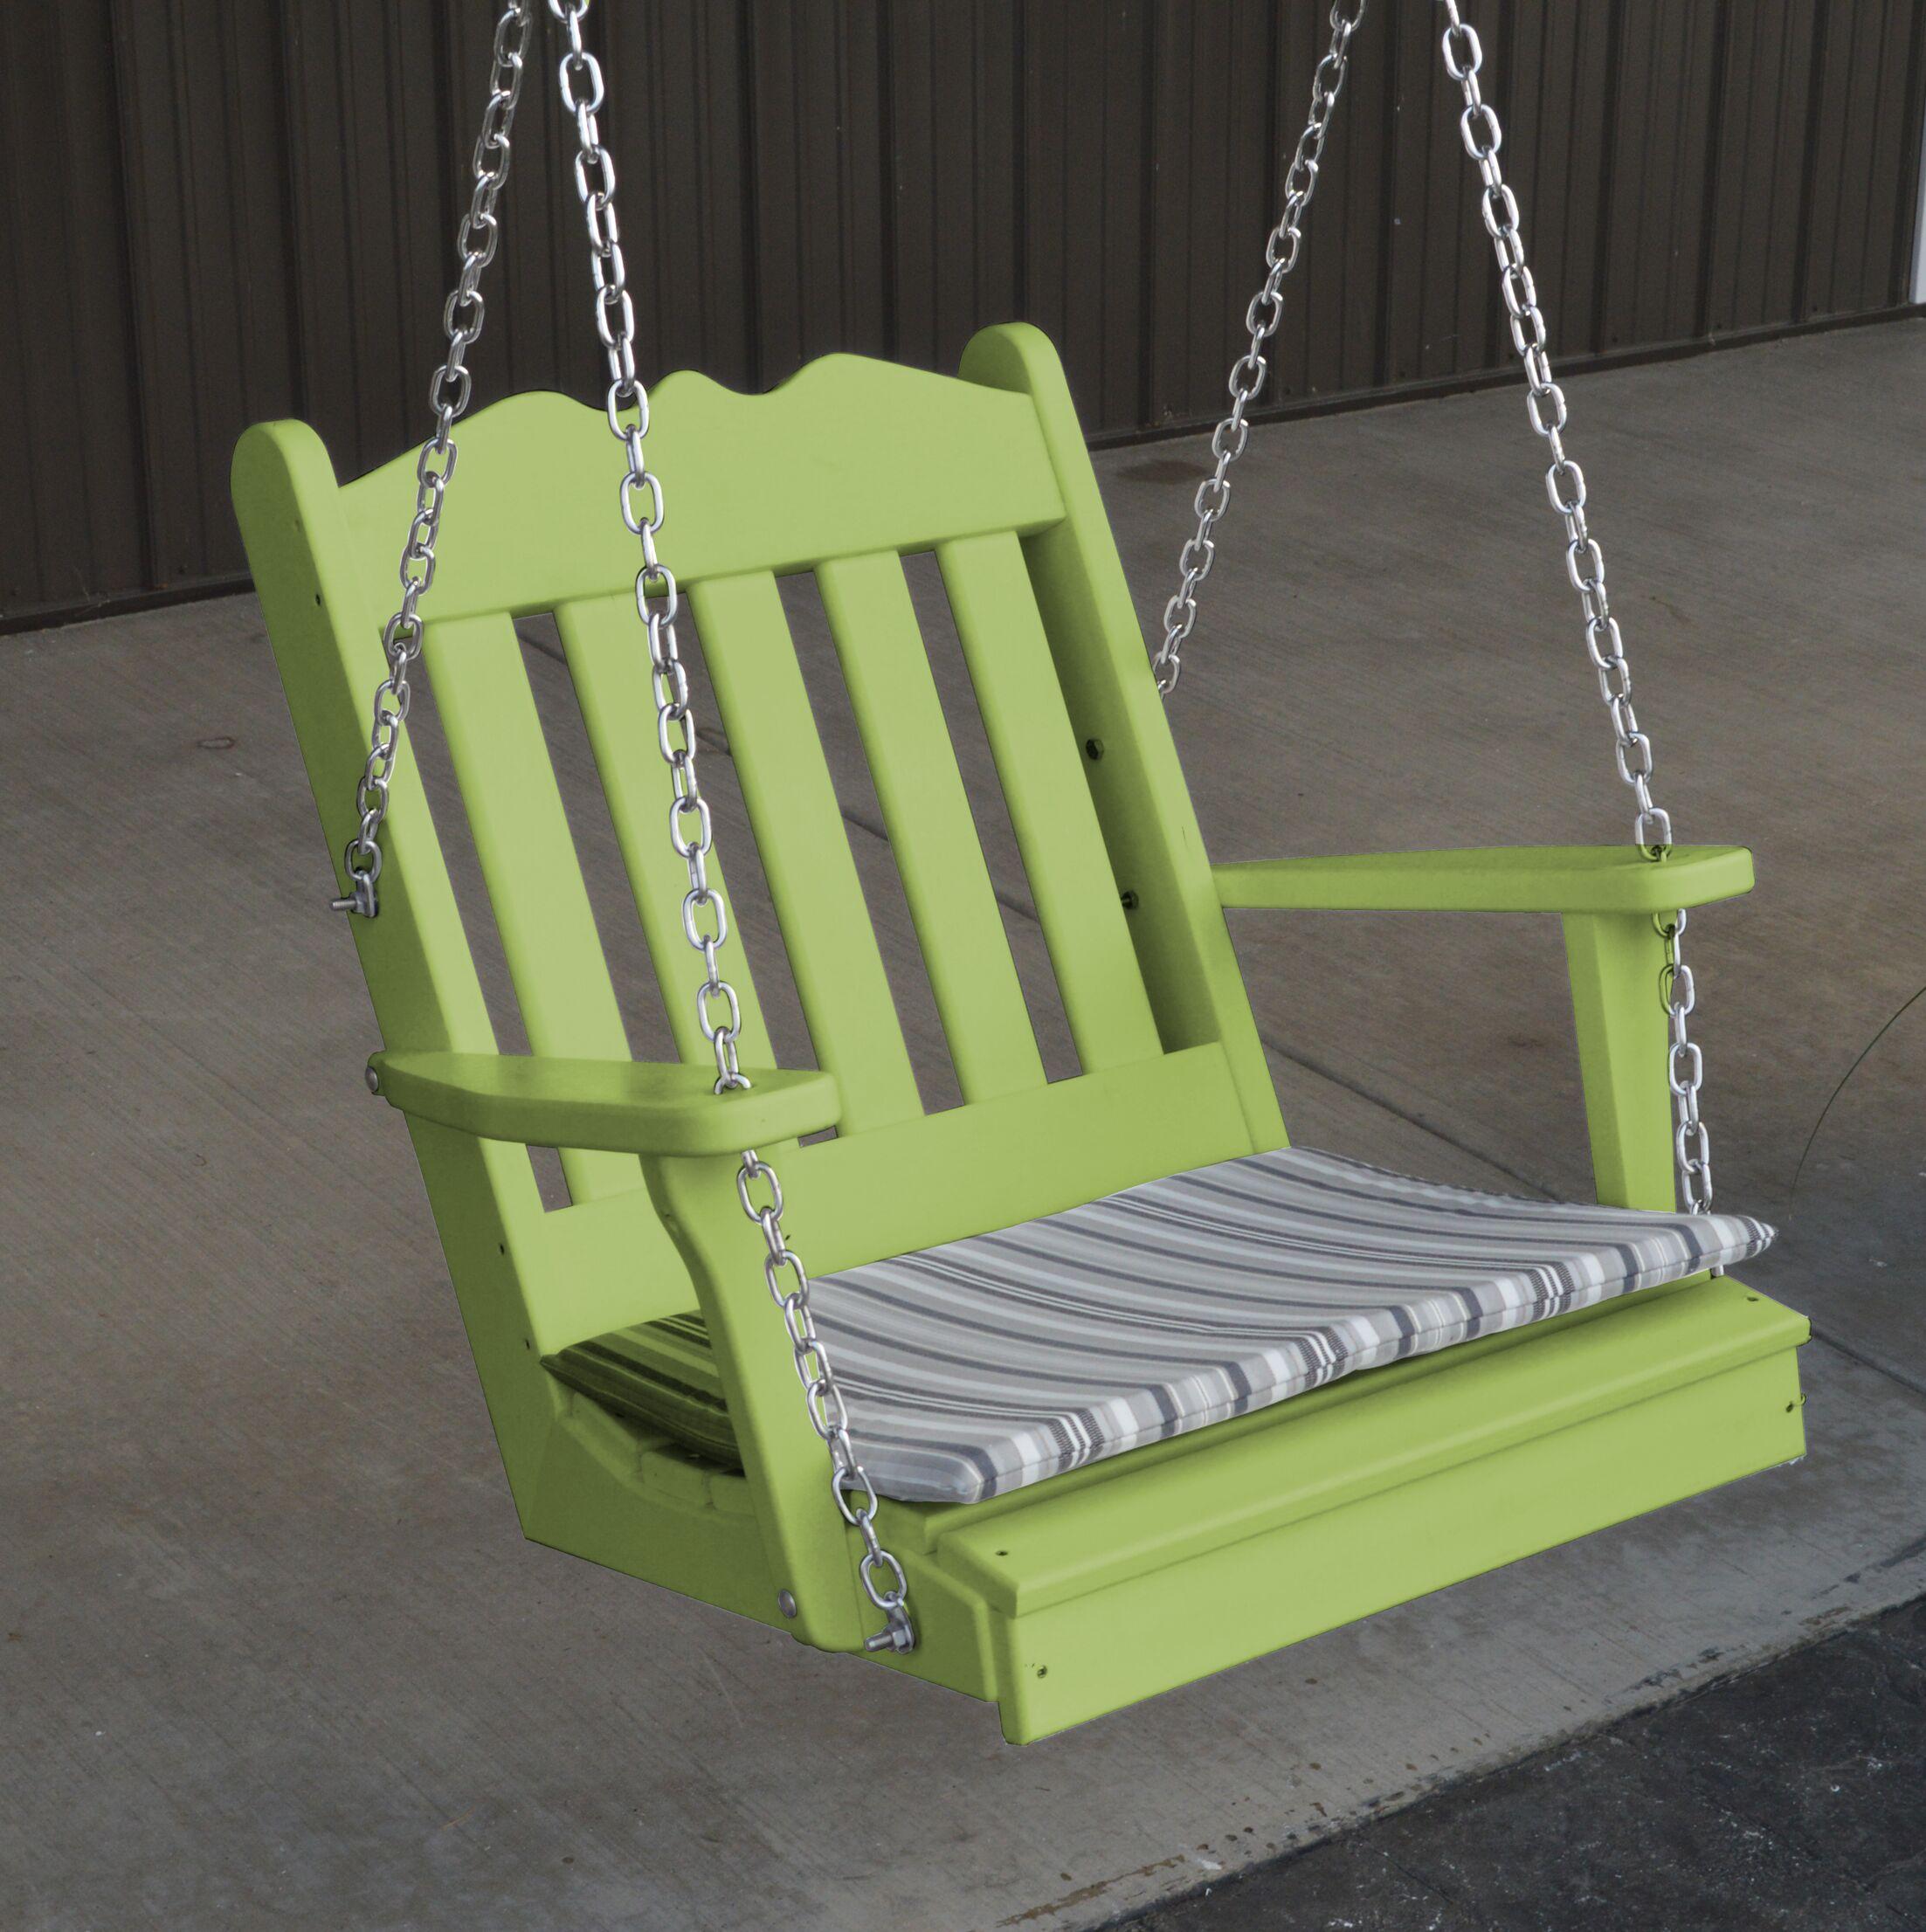 Pi Royal English Porch Swing Color: Lime